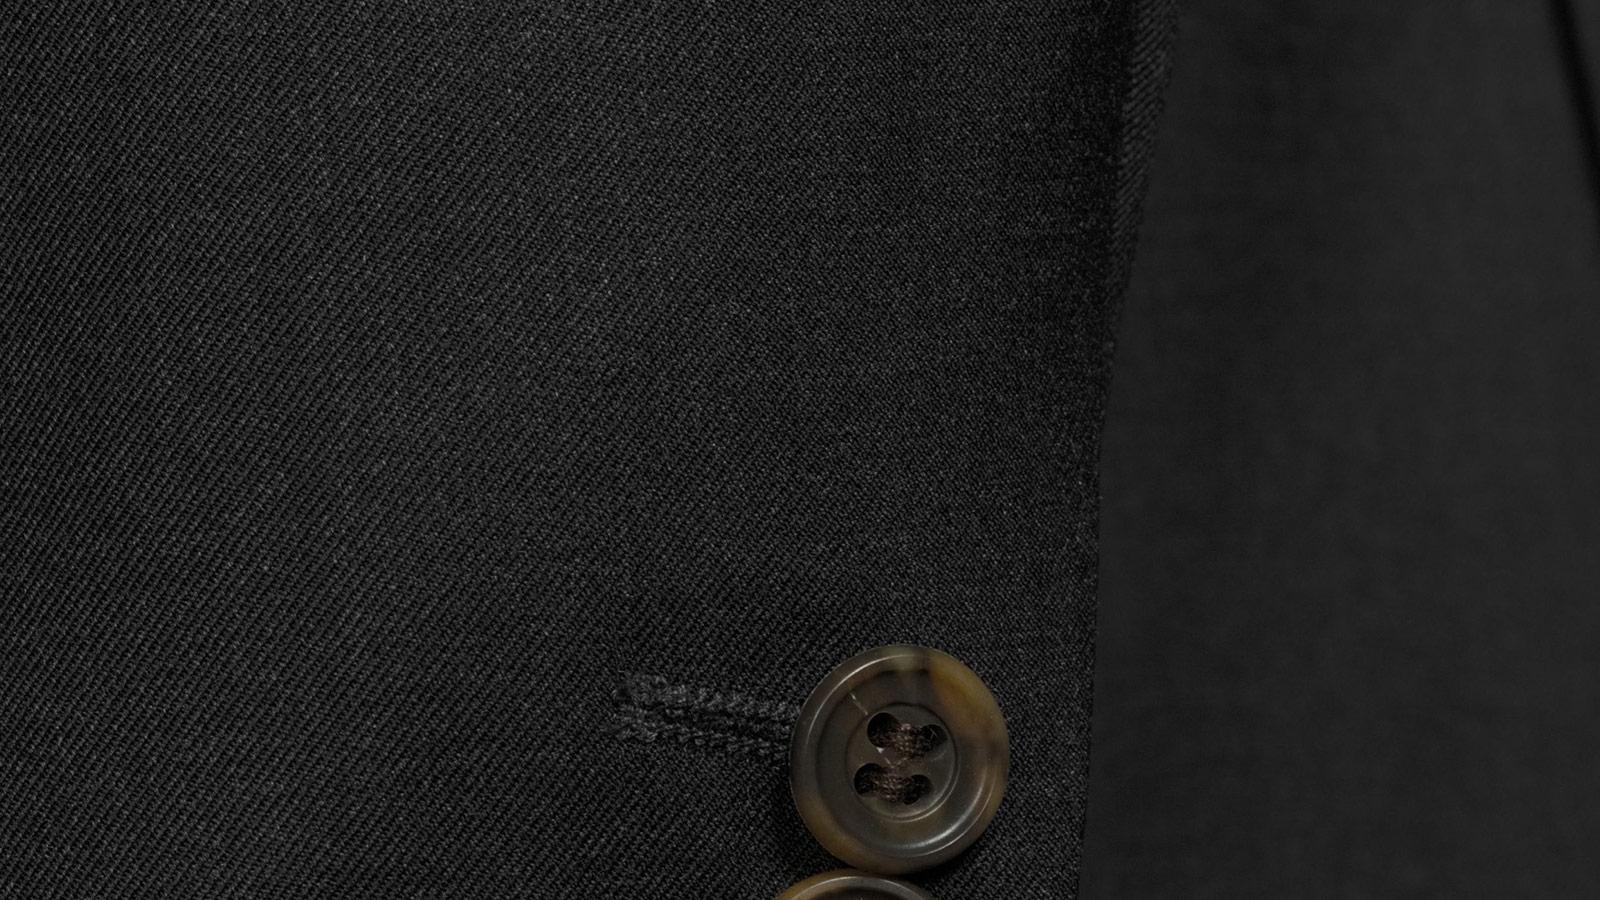 Vendetta Premium Charcoal Suit - slider image 1